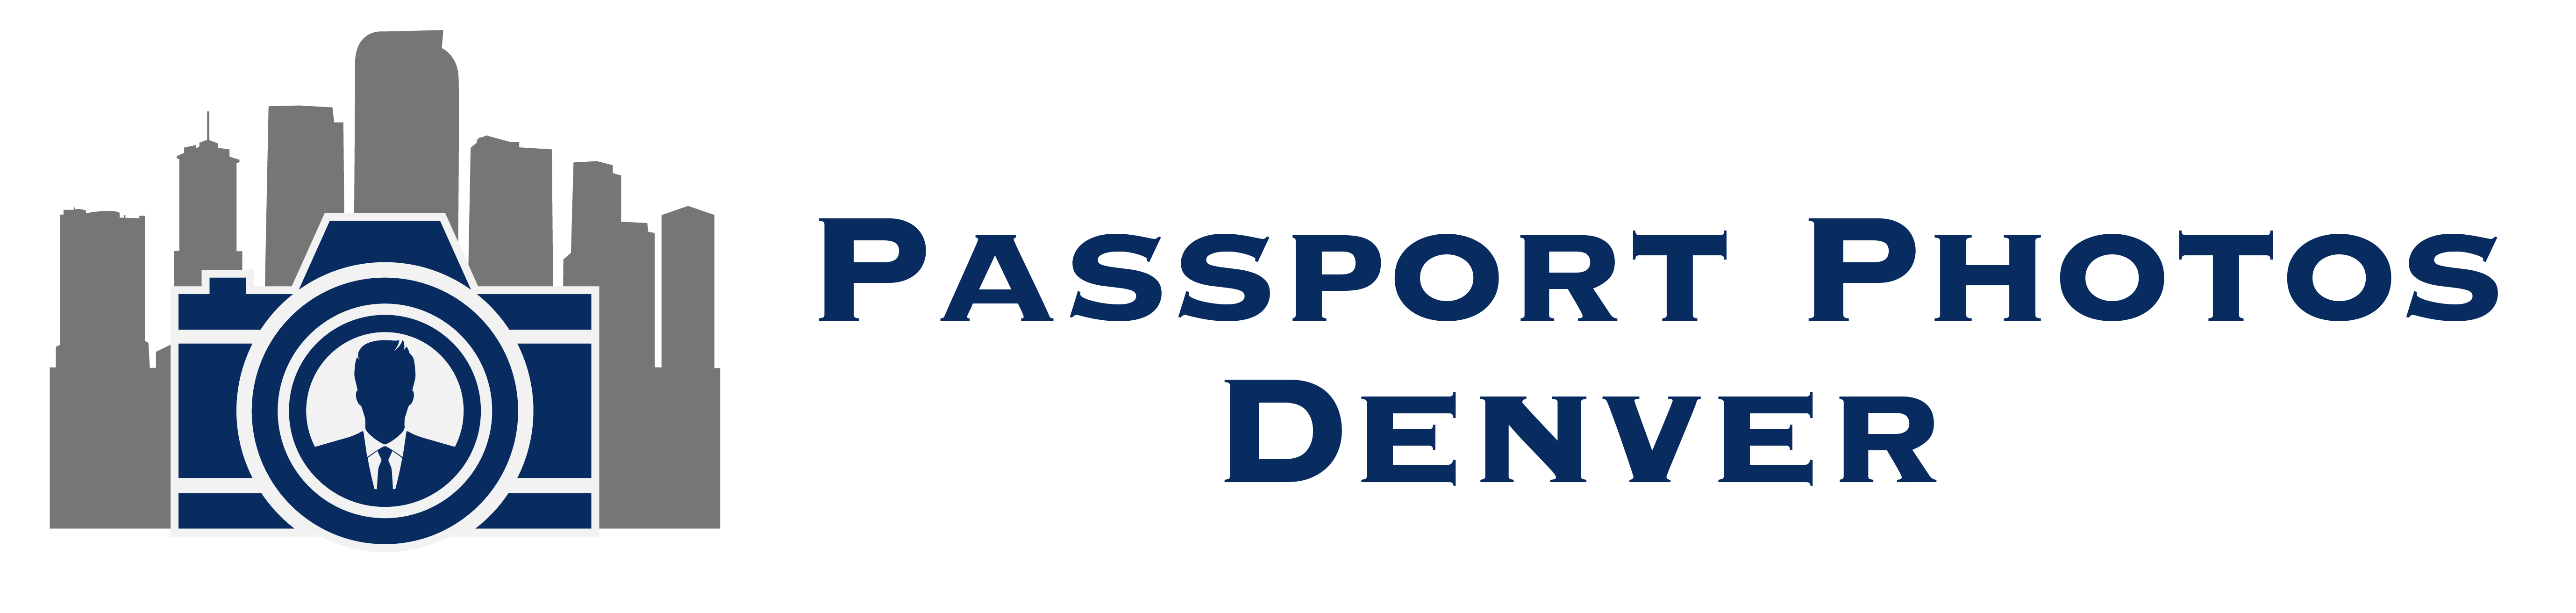 PassportPhotosDenver